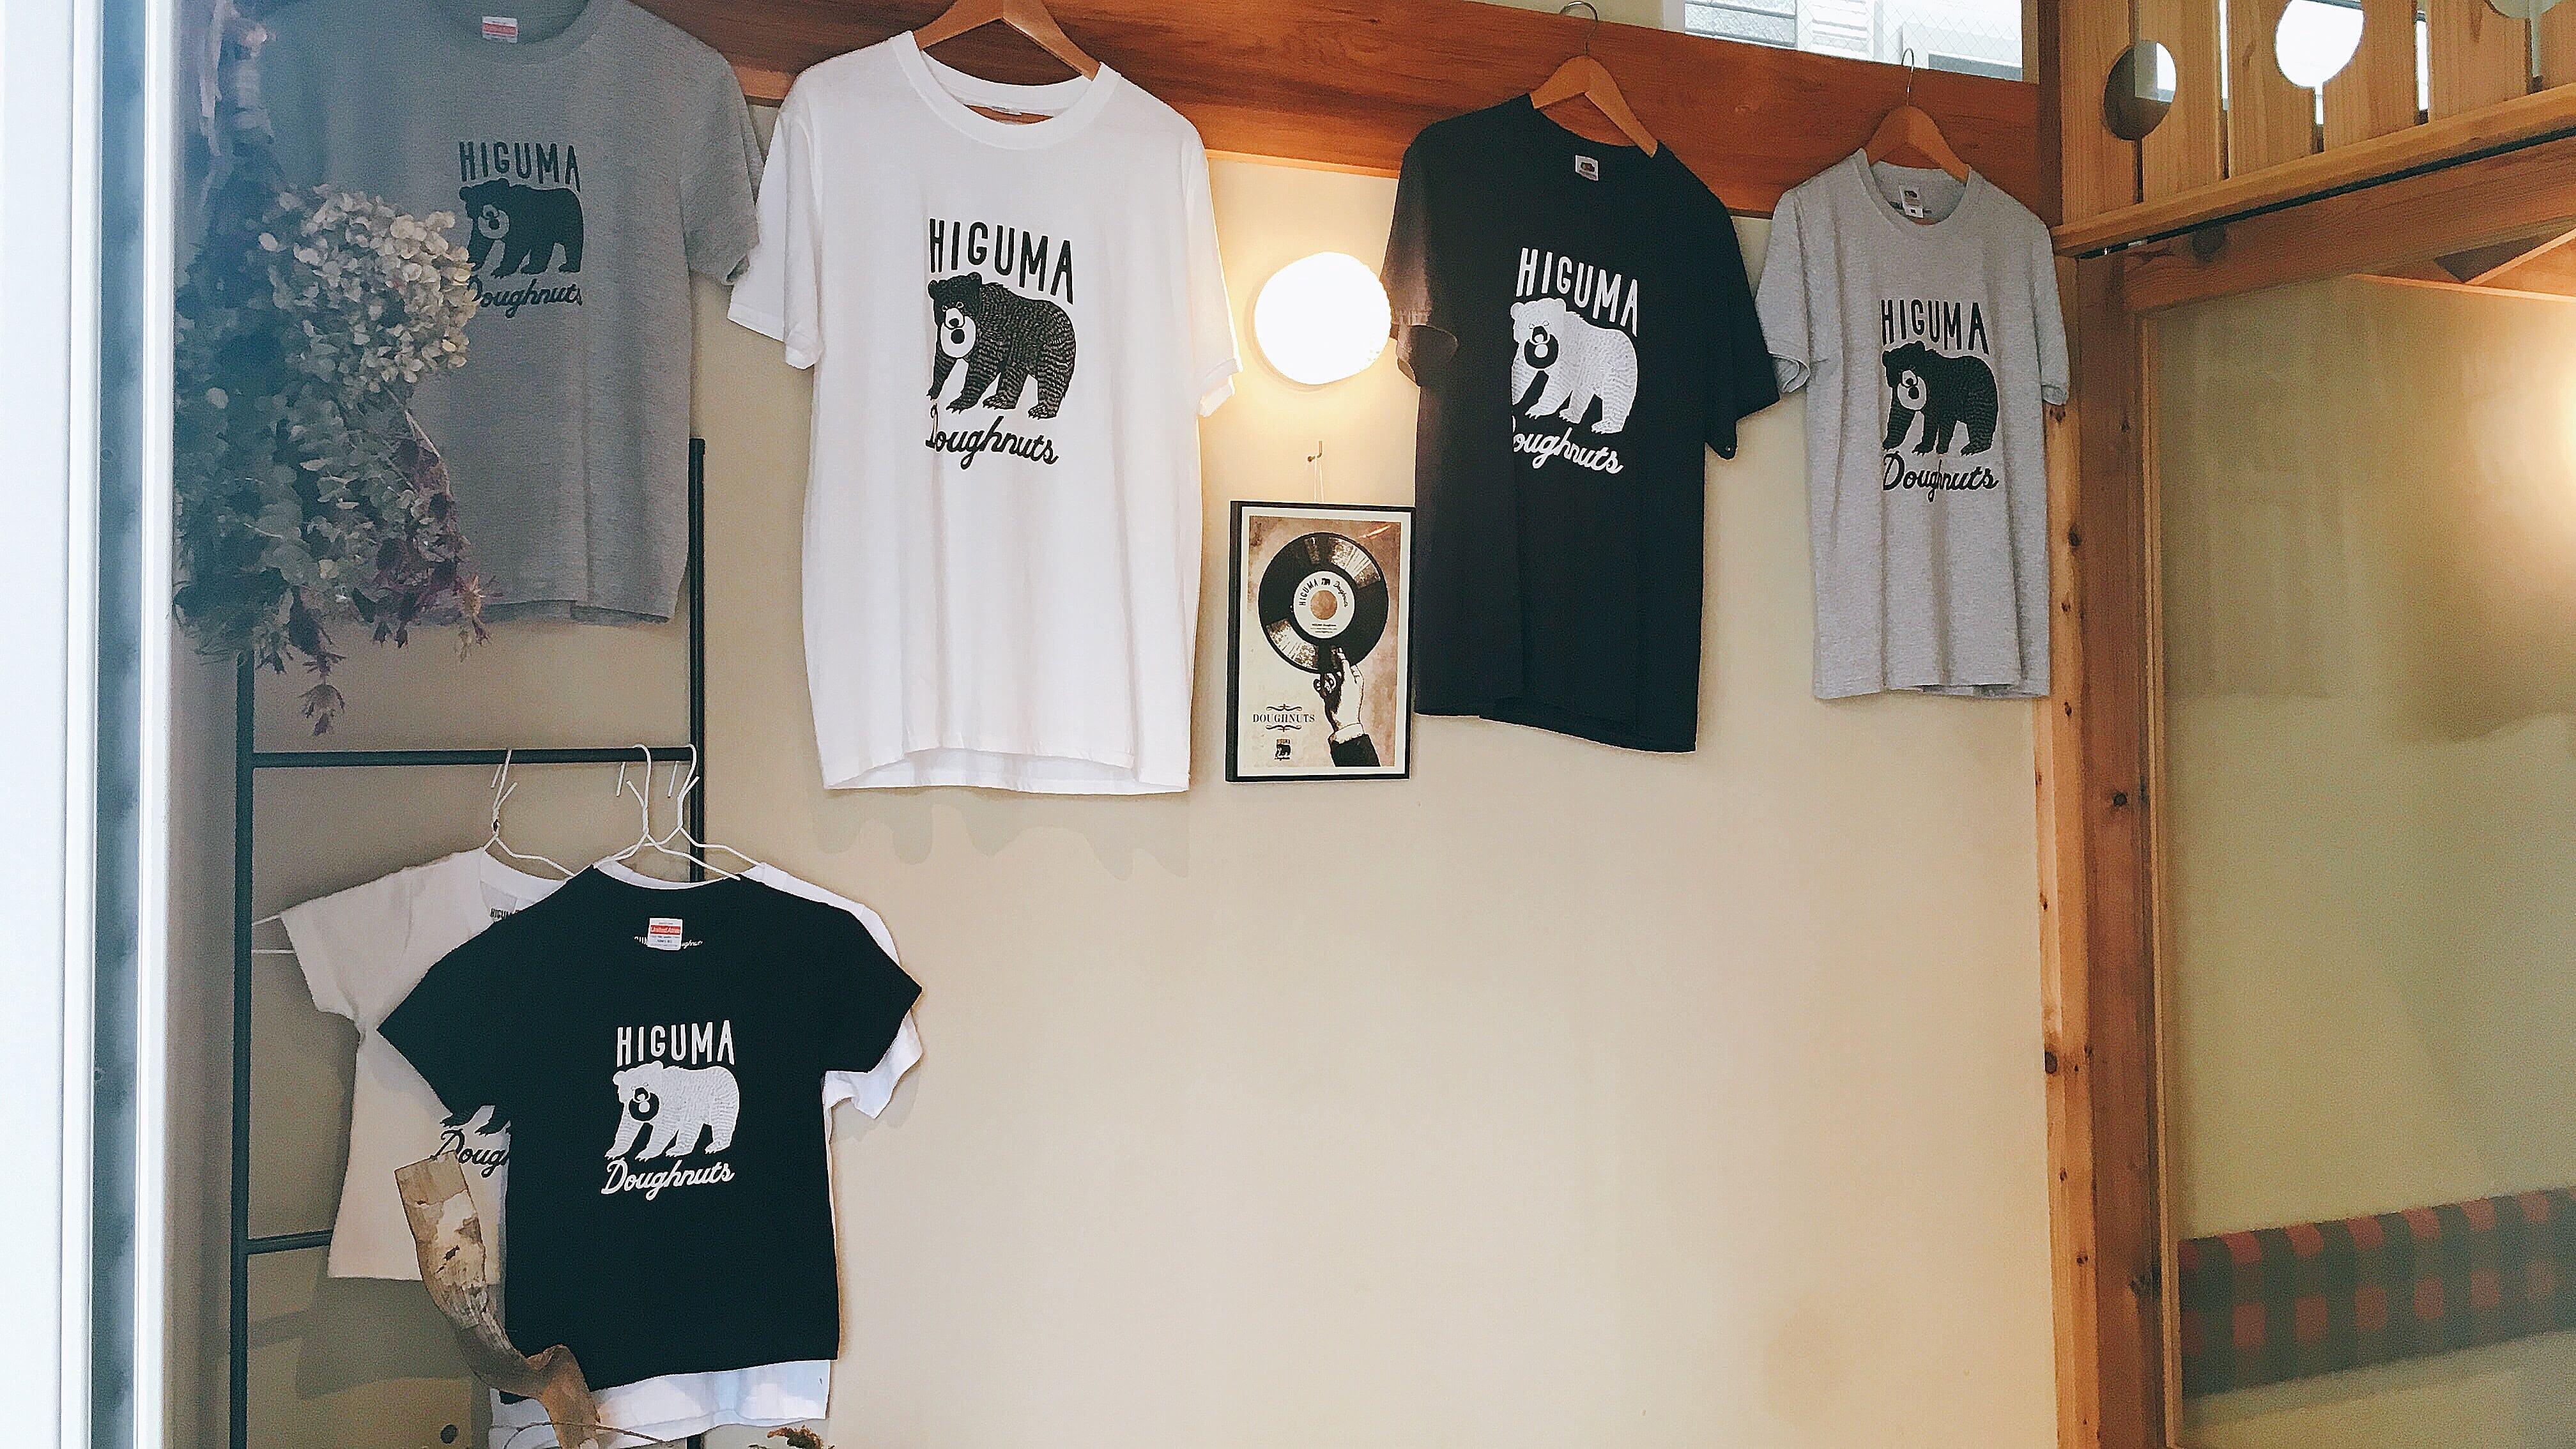 HIGUMA Doughnuts(ヒグマドーナッツ)のTシャツ物販